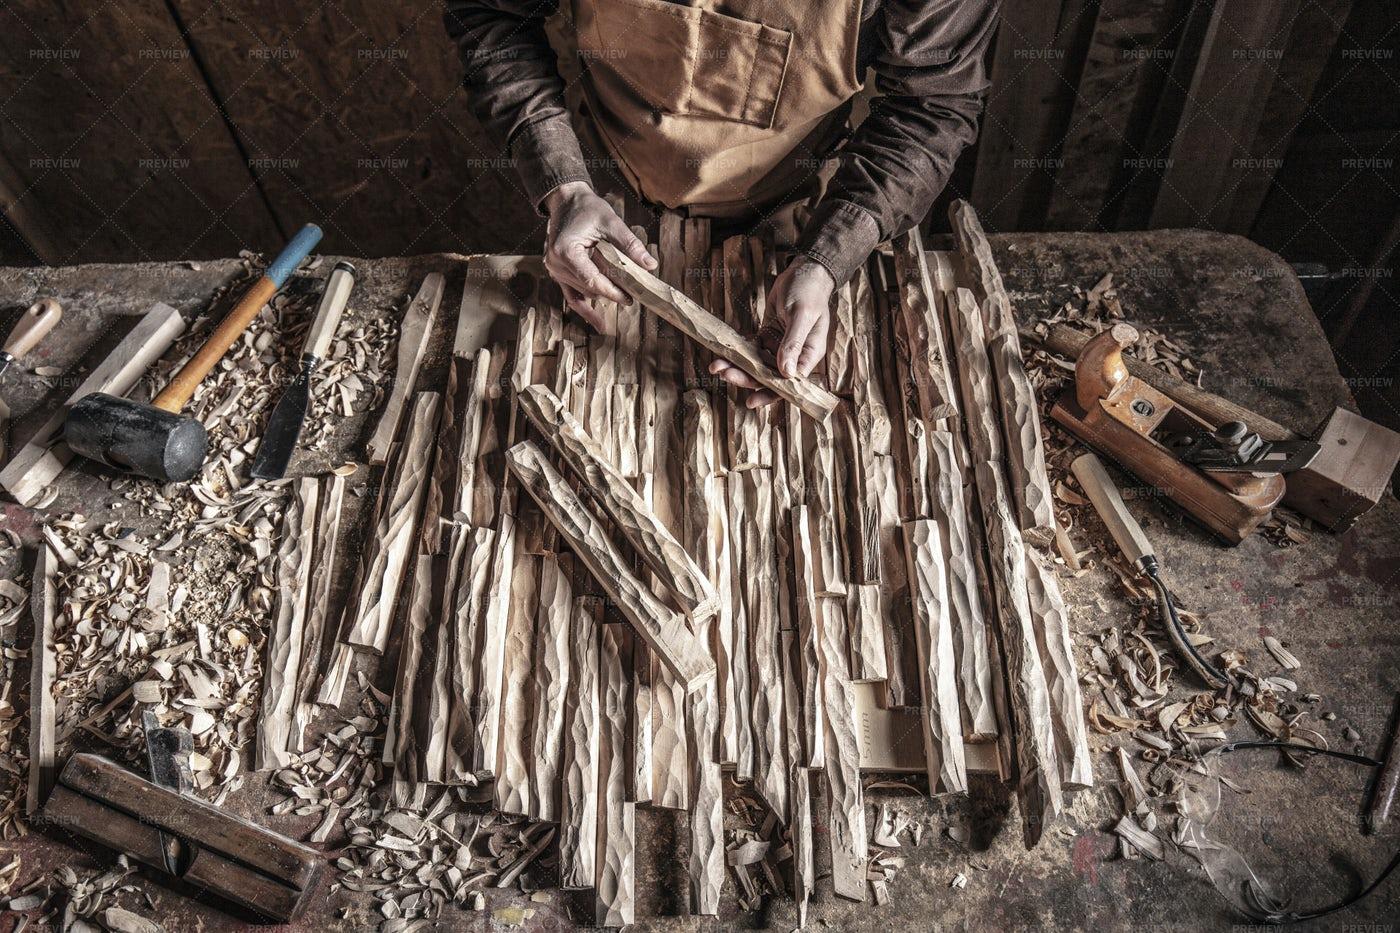 Carpenter In Workshop: Stock Photos